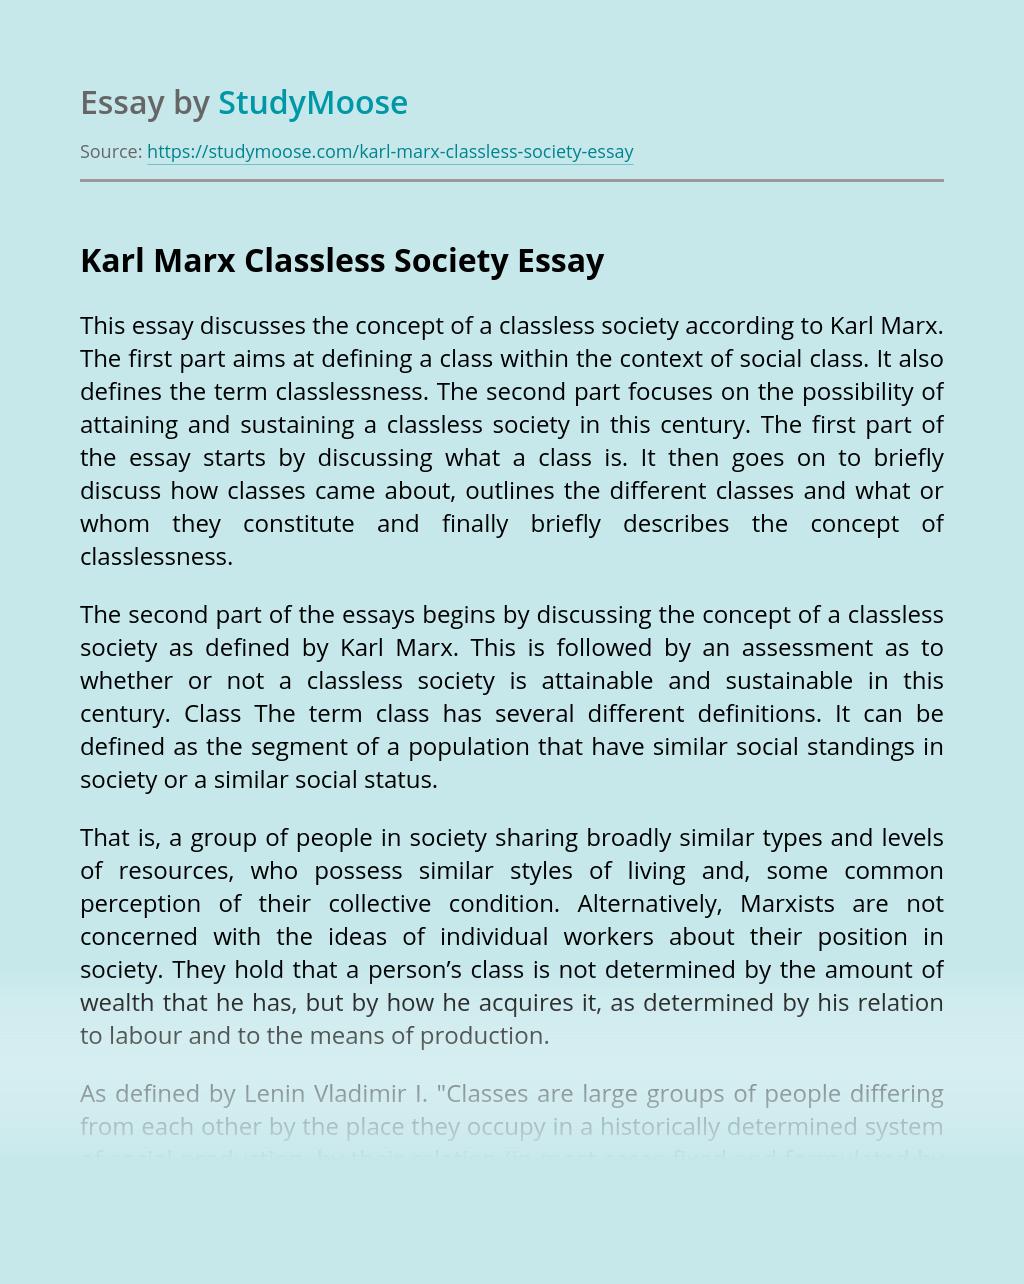 Karl Marx Classless Society